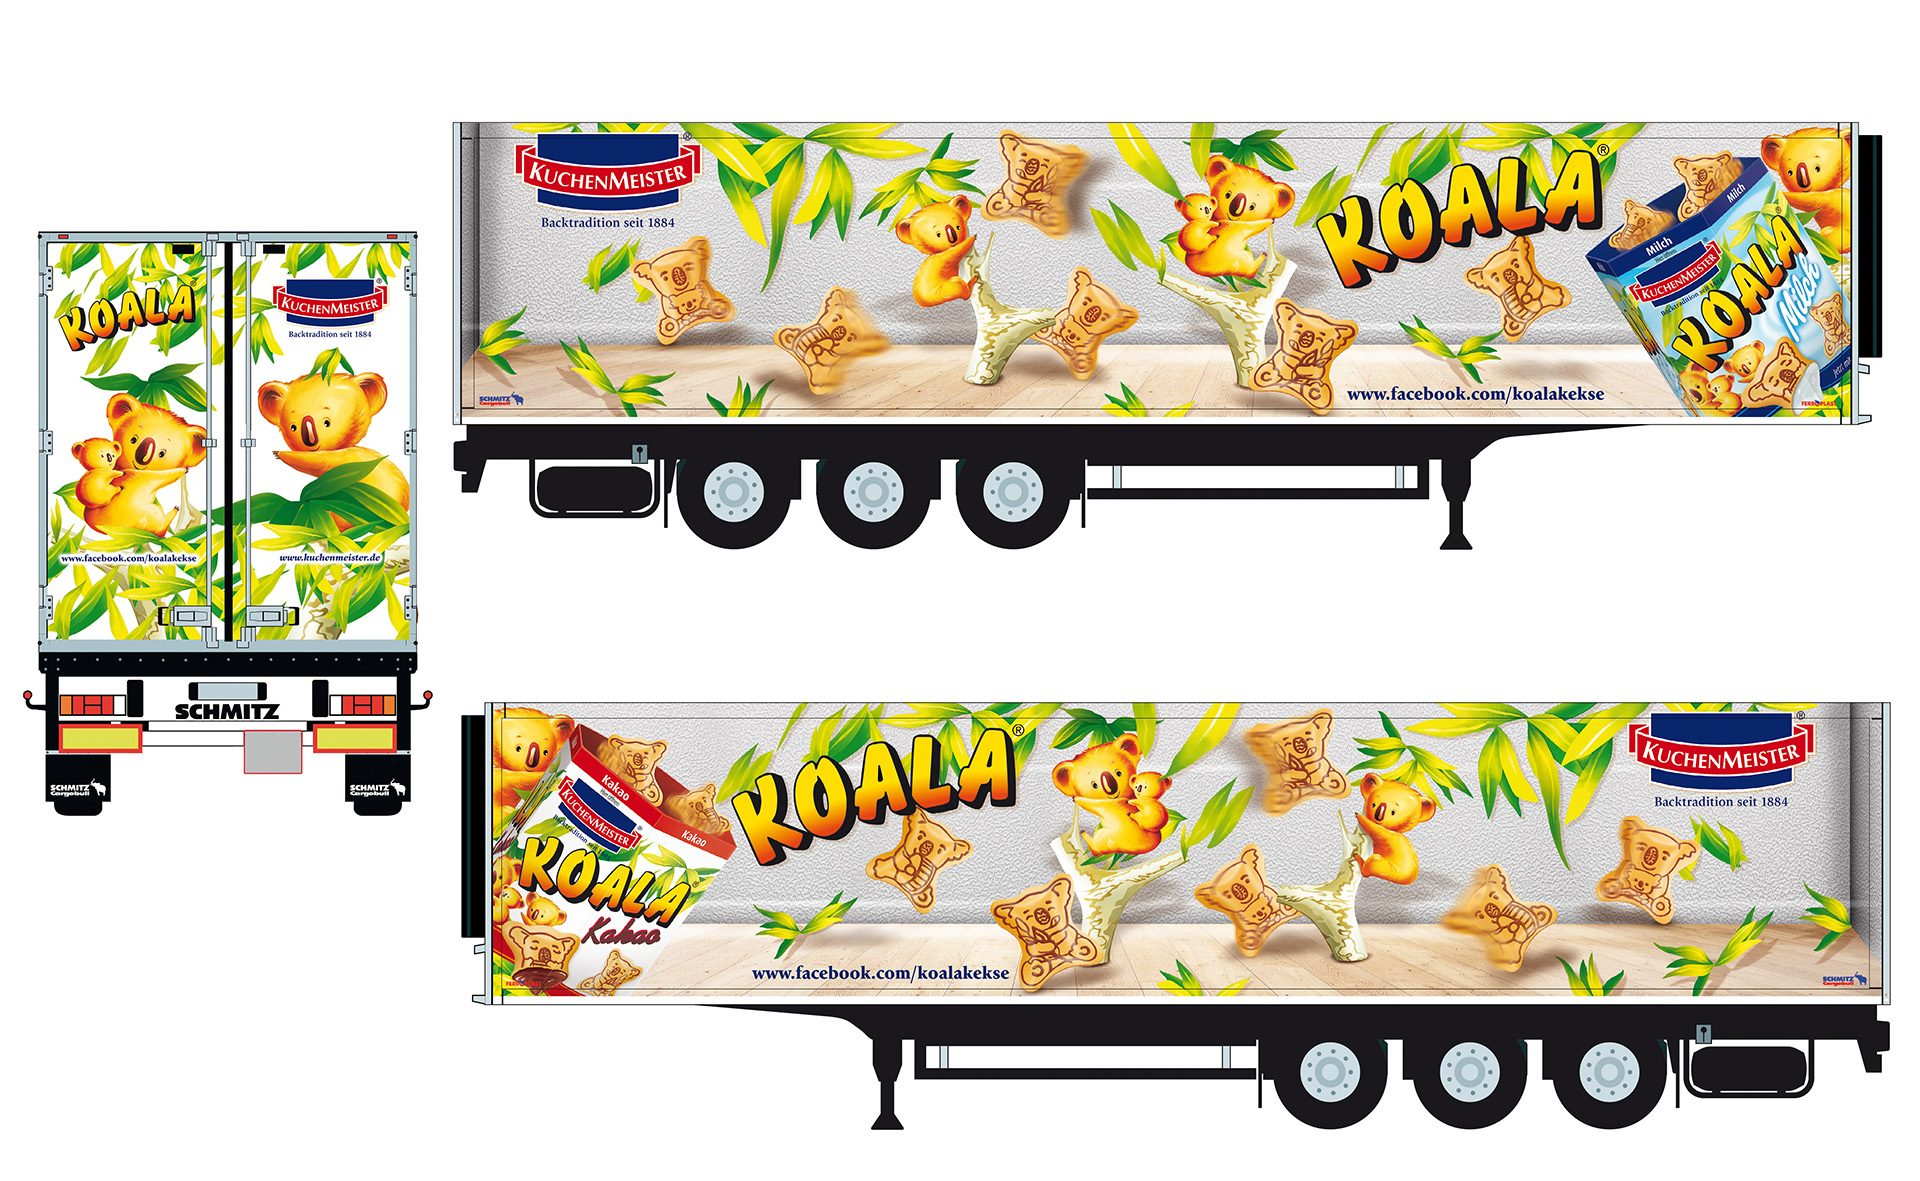 Verpackungsdesign Malvega - Referenz: Koala Keks, Kuchenmeister